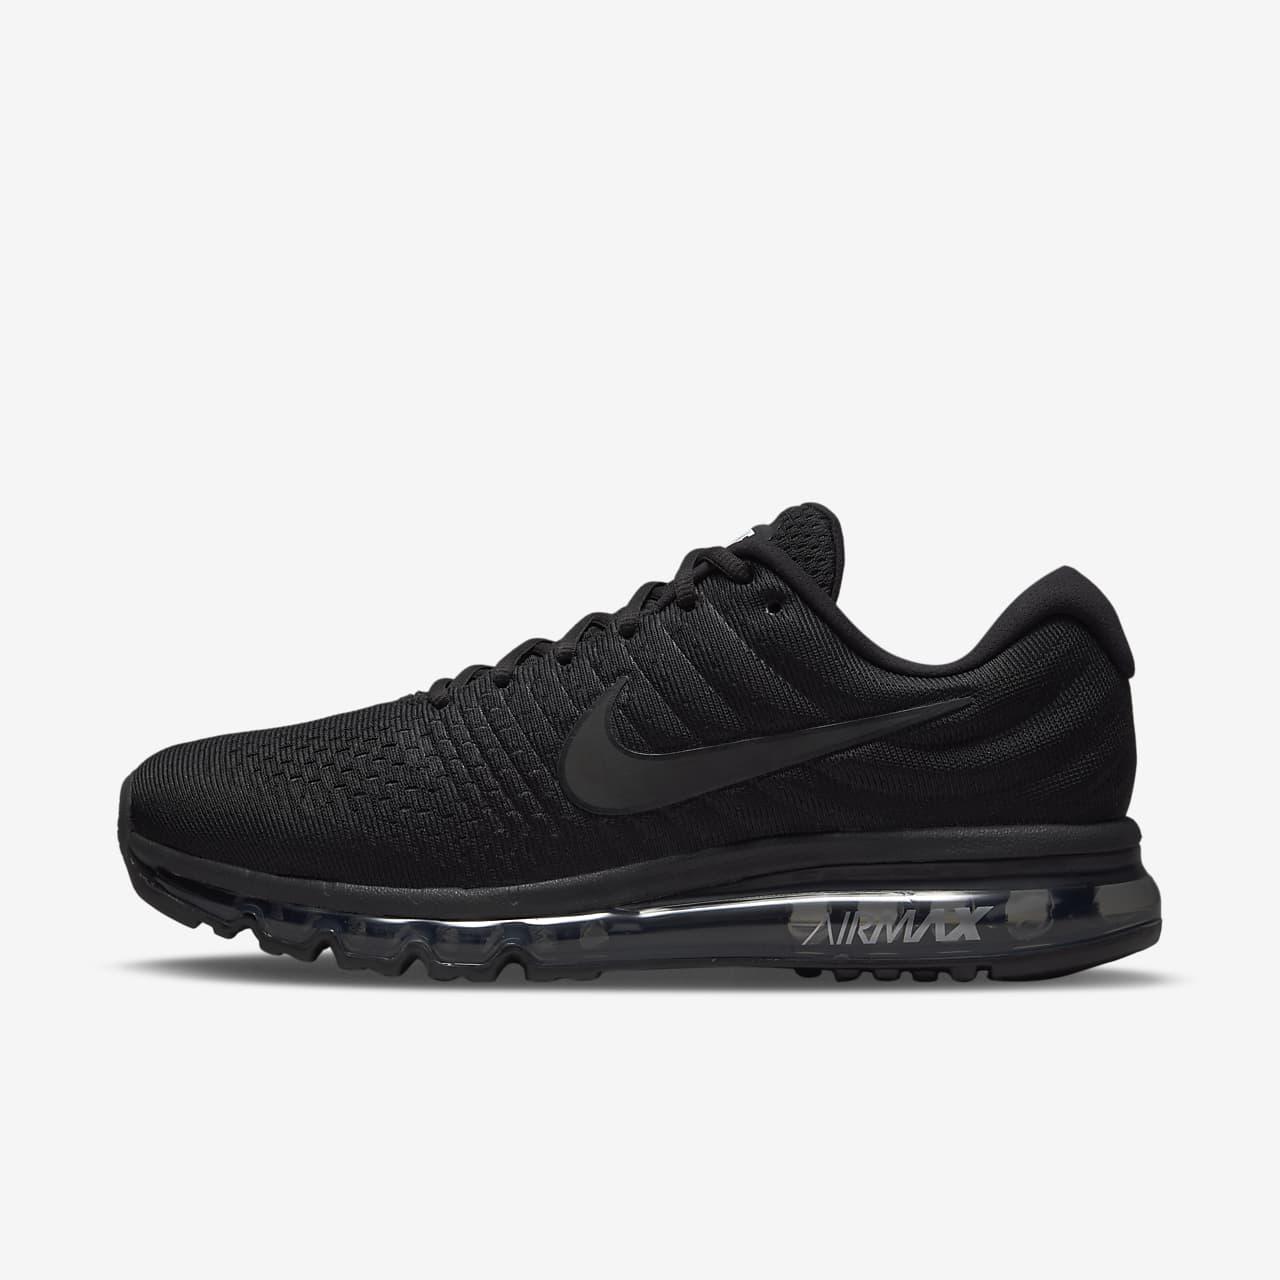 online store 4e19e 7db96 ... Sko Nike Air Max 2017 för män